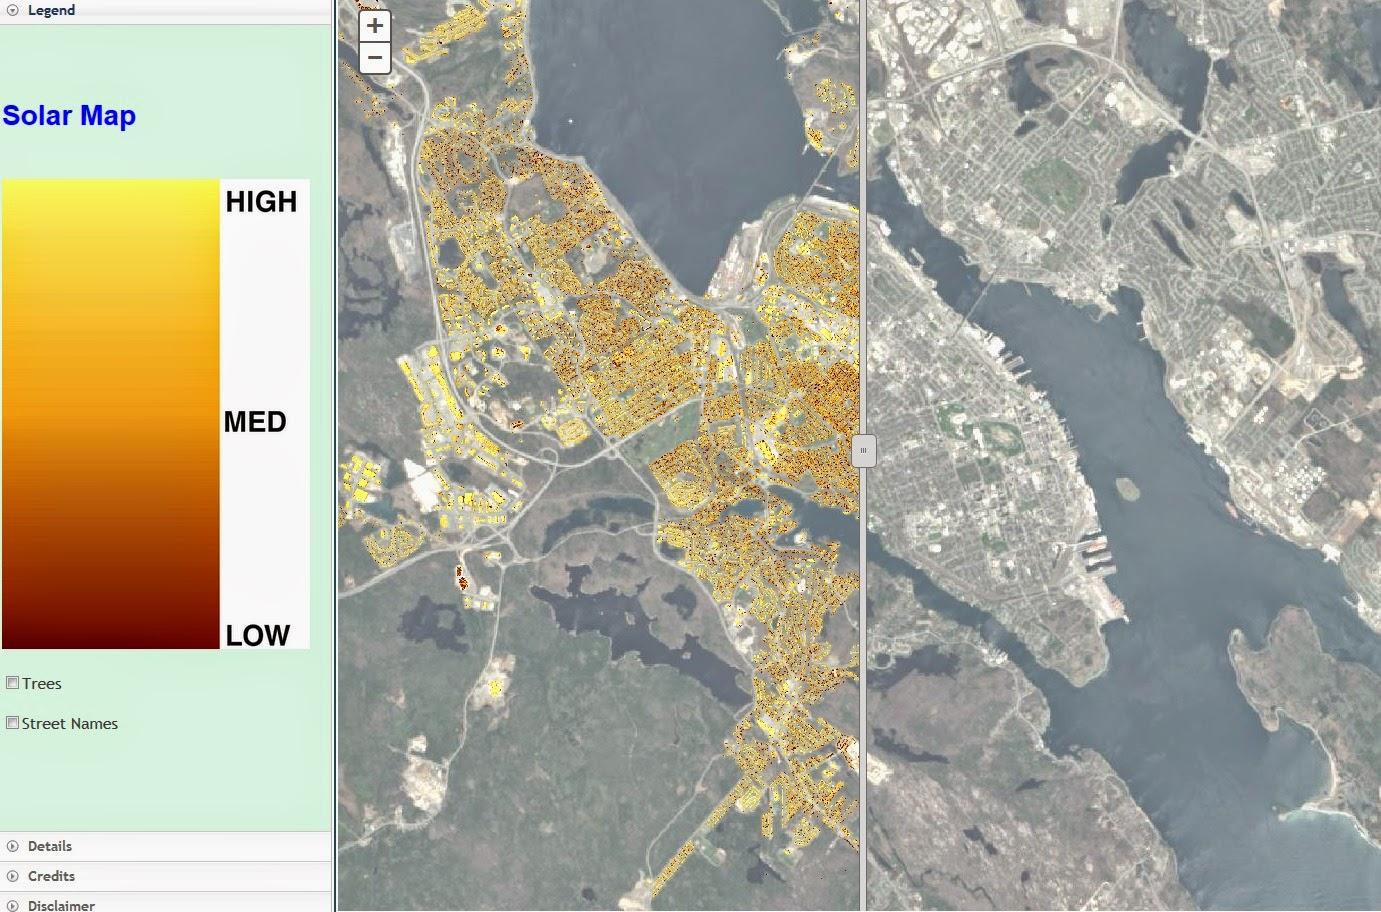 http://maps.halifax.ca/solarcity/solarmap.html